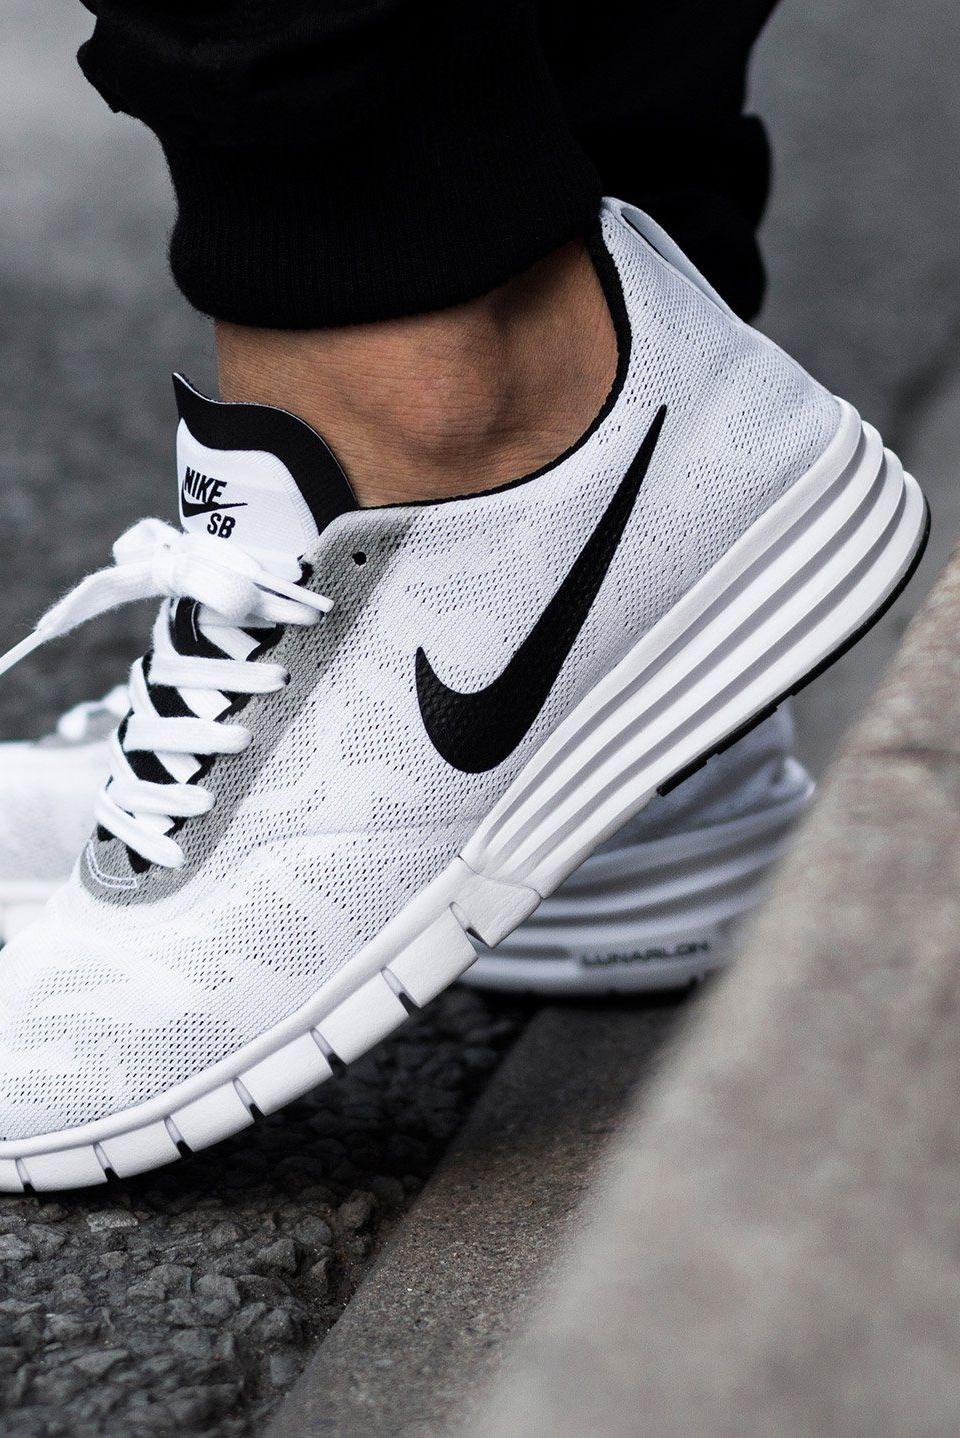 Nike SB Lunar Paul Rodriguez 9 #sneakers #sneakernews